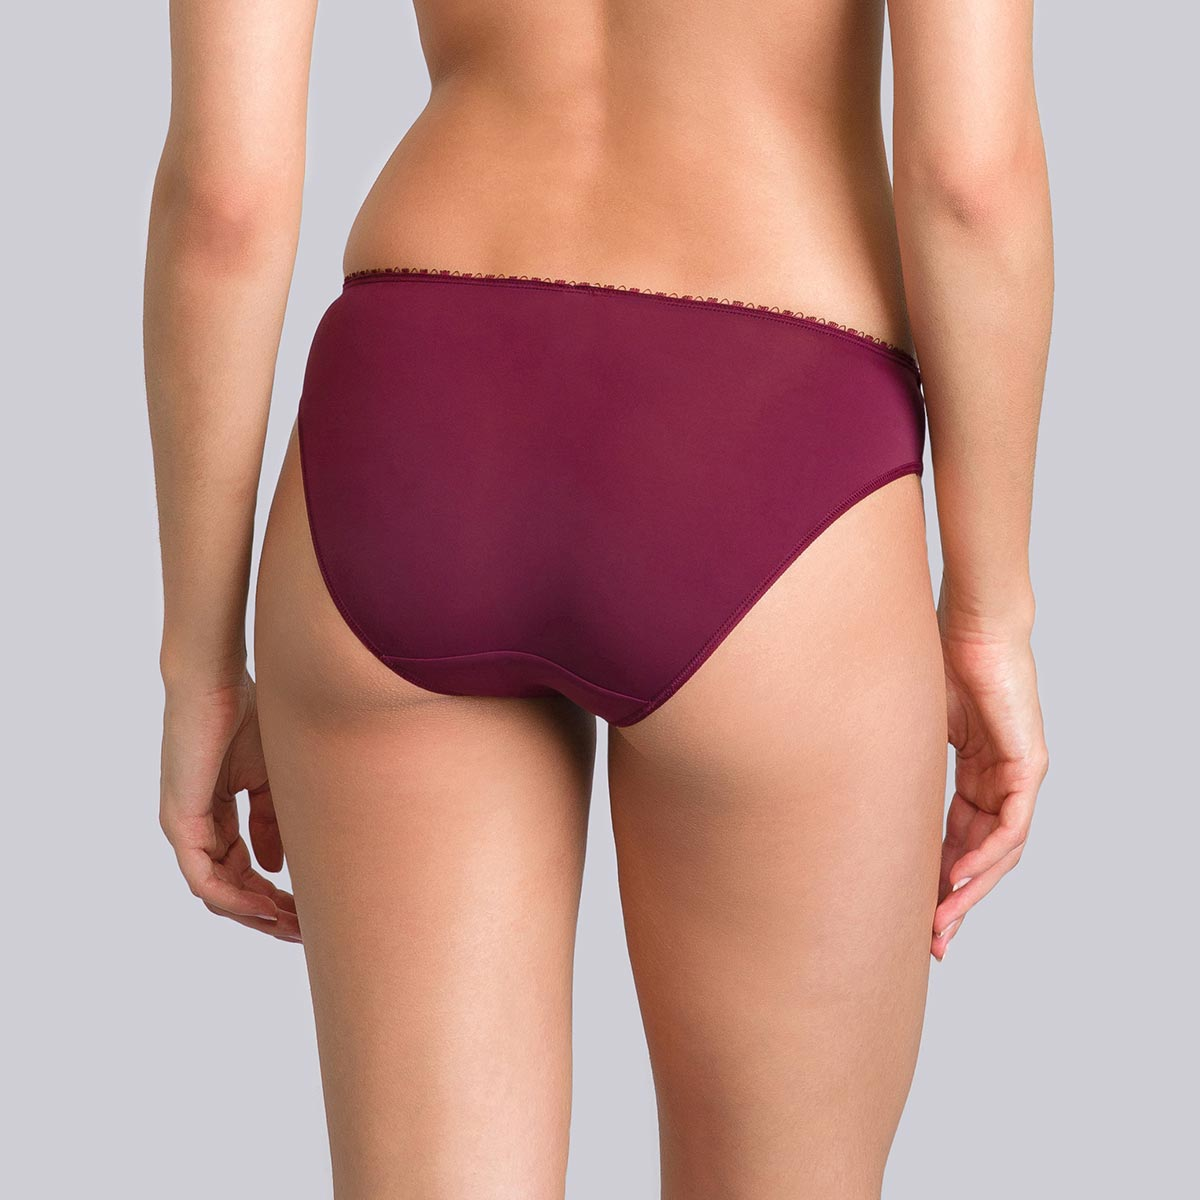 Purple burgundy mini briefs - Flower Elegance-PLAYTEX